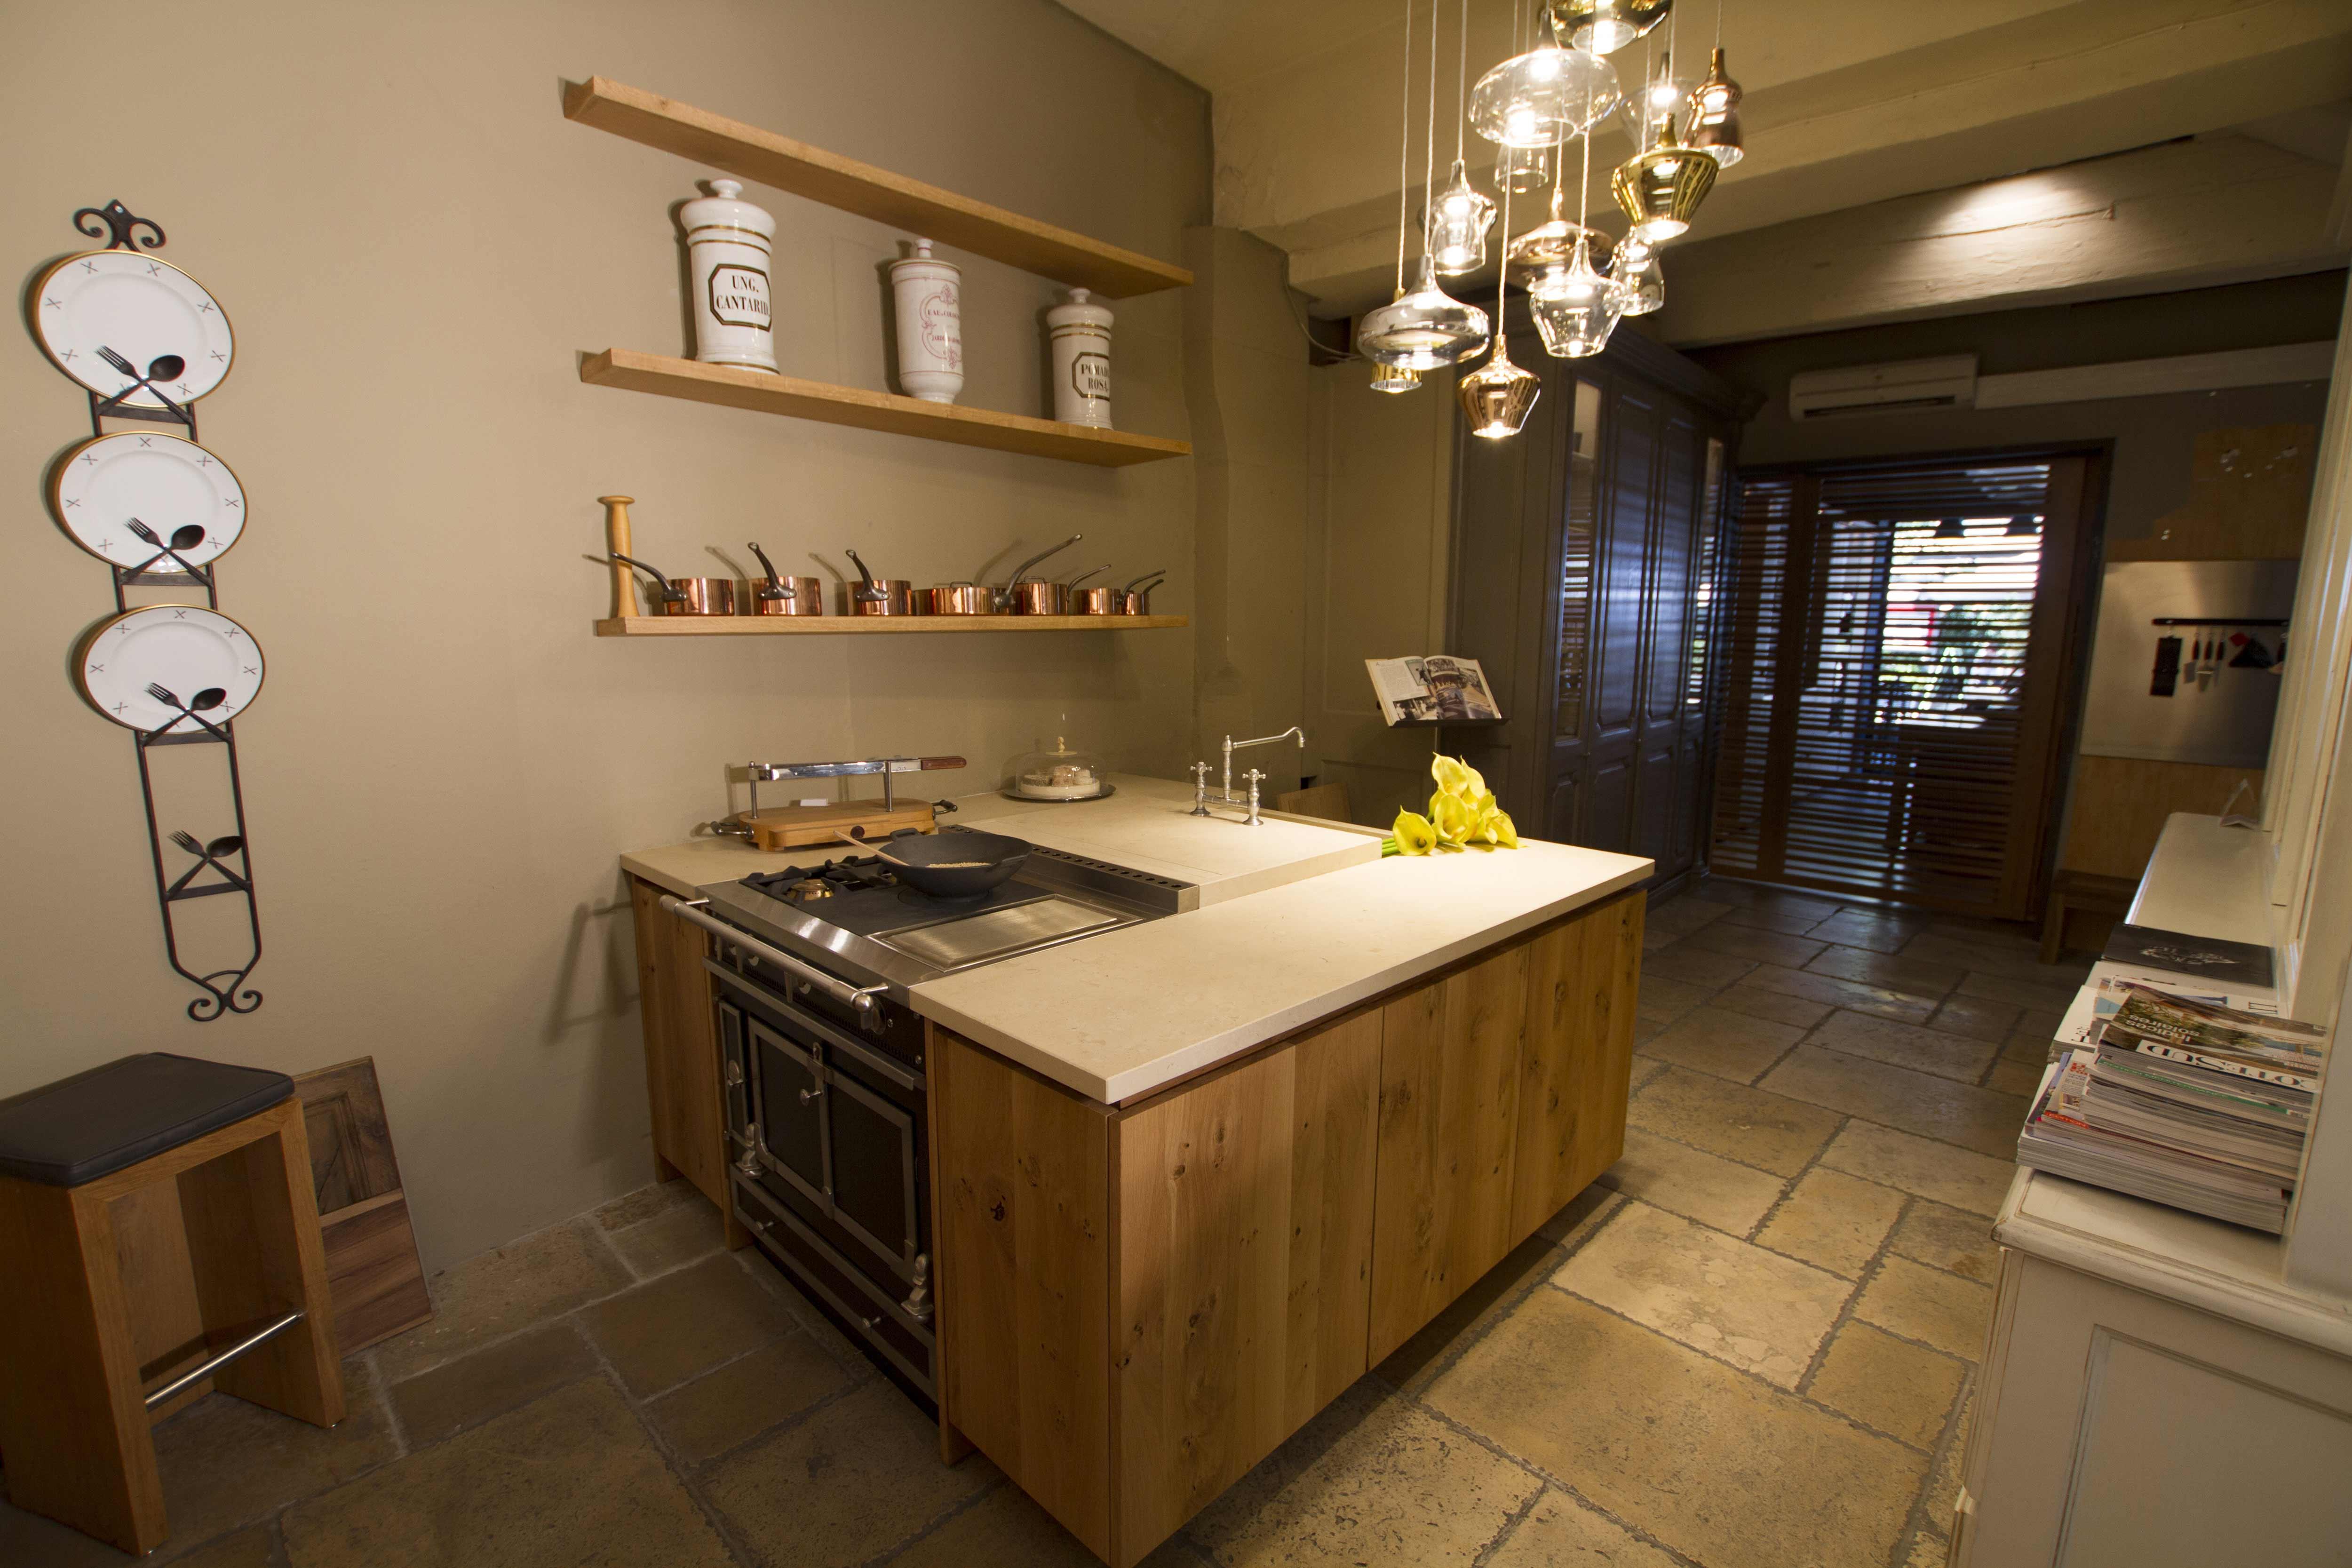 magasin avignon 13 cuisines mouvement. Black Bedroom Furniture Sets. Home Design Ideas